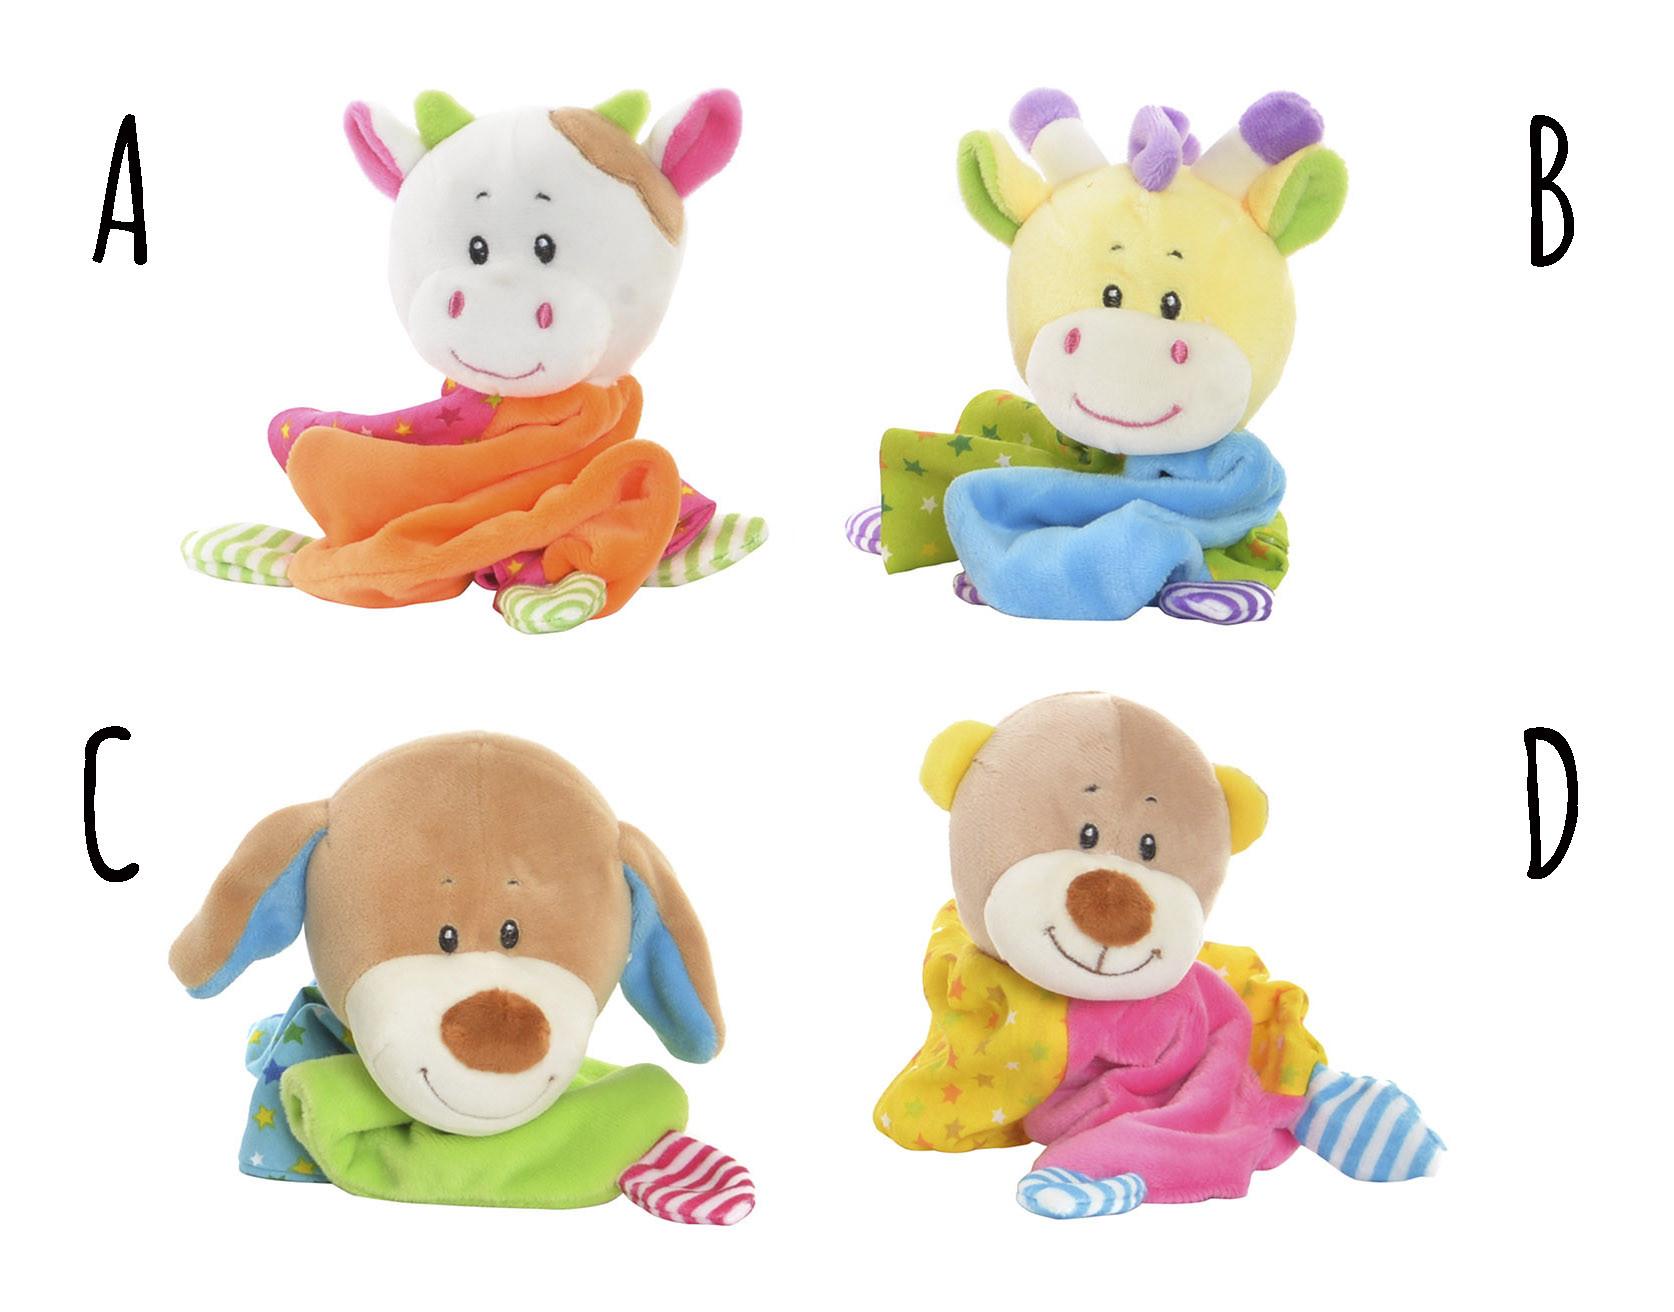 Doudou de animales para bebés, Peluche con Mantita en 4 Modelos a elegir. Original/Infantil 10X8X20 cm